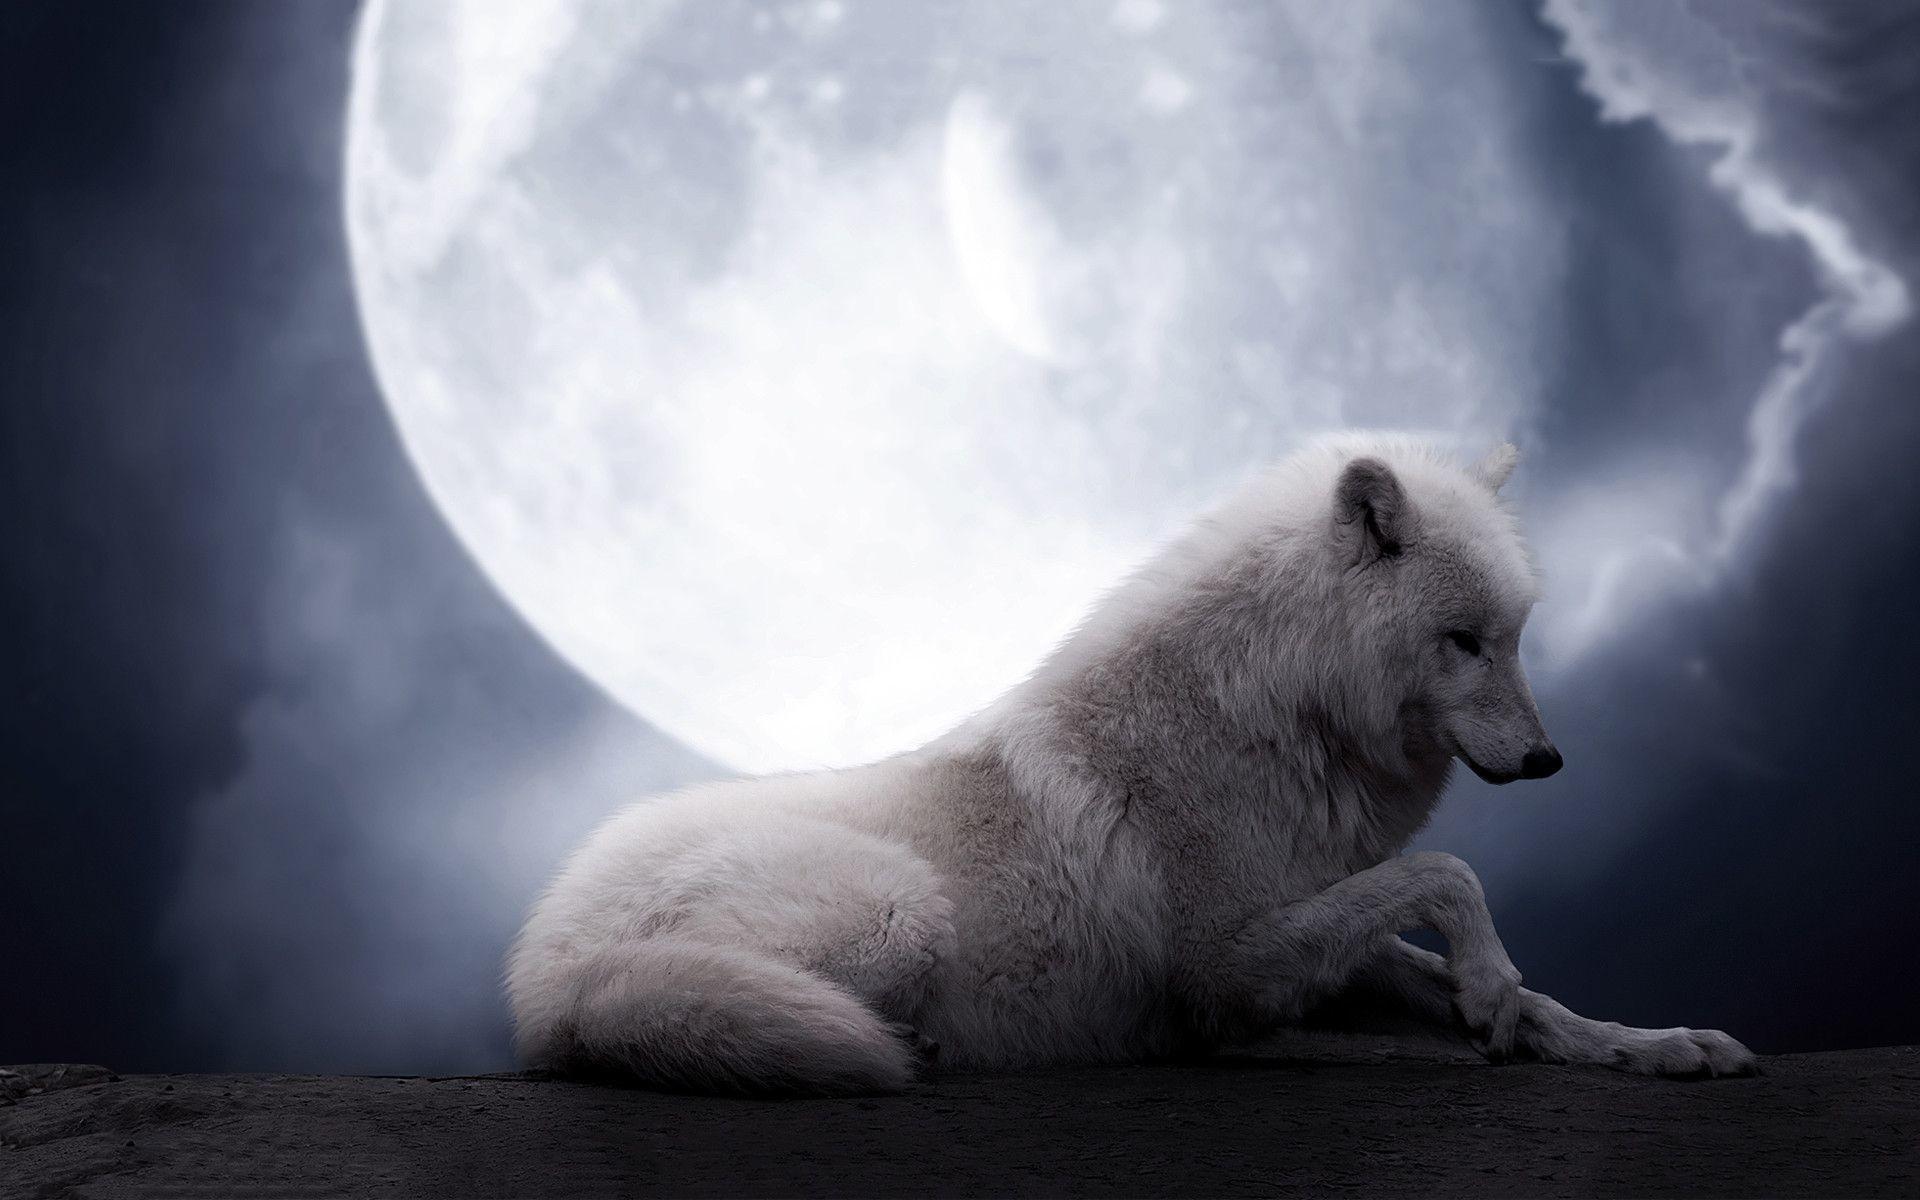 desktop wallpaper for wolf moon, 862 kB – Beowulf Robertson